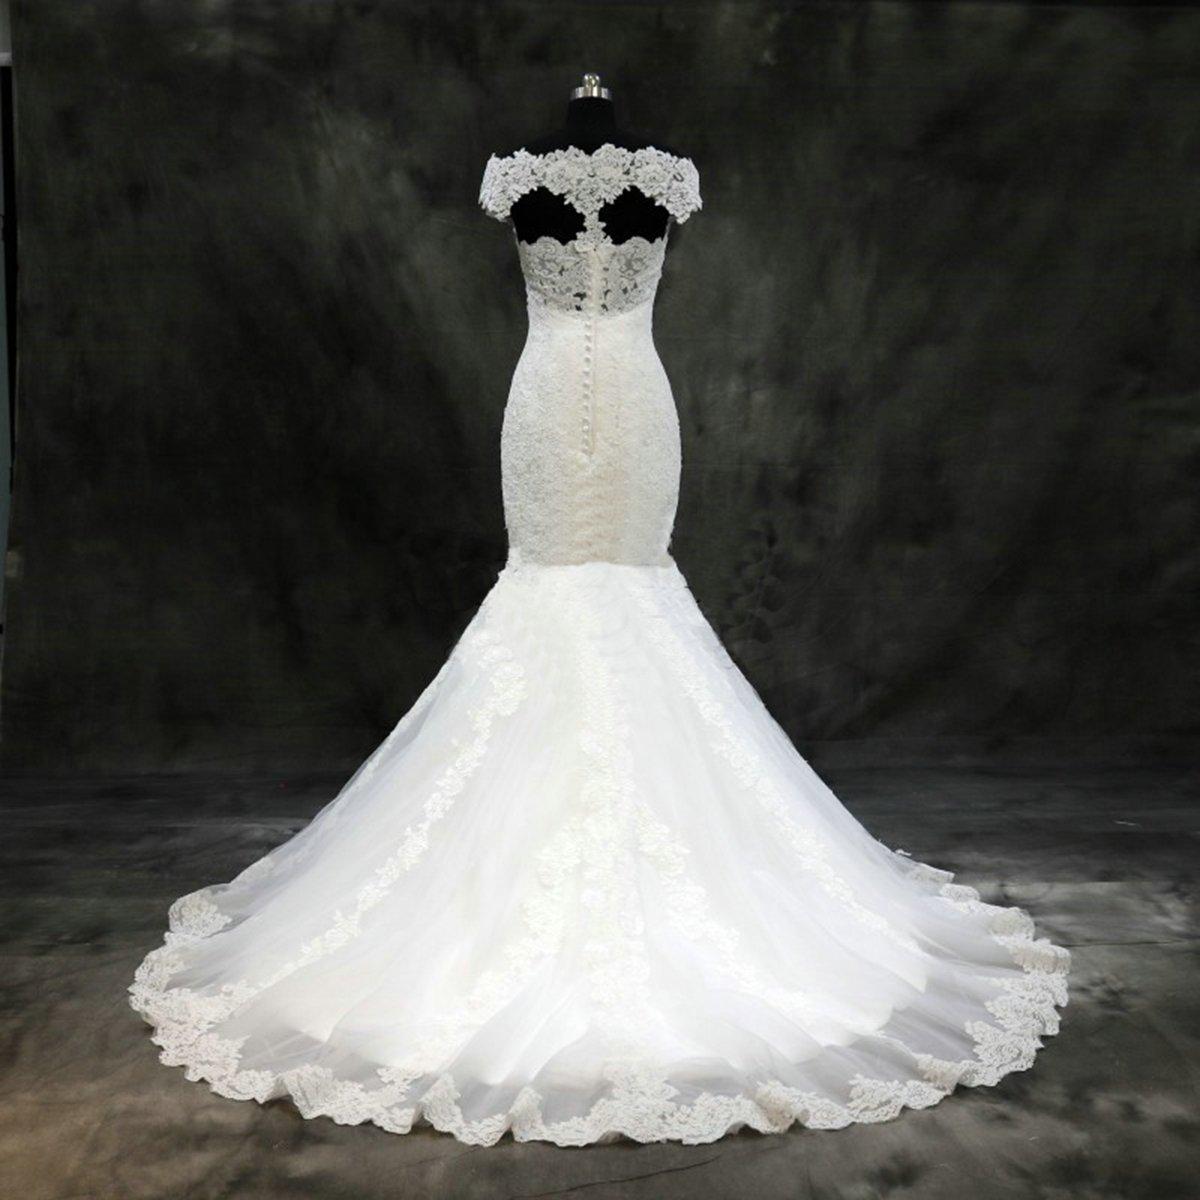 Girls Dress 2018 Vestidos de Novia Con Encaje Boat Neck Lace Appliques Mermaid Keyhole Back Wedding Dress for Bridal at Amazon Womens Clothing store: